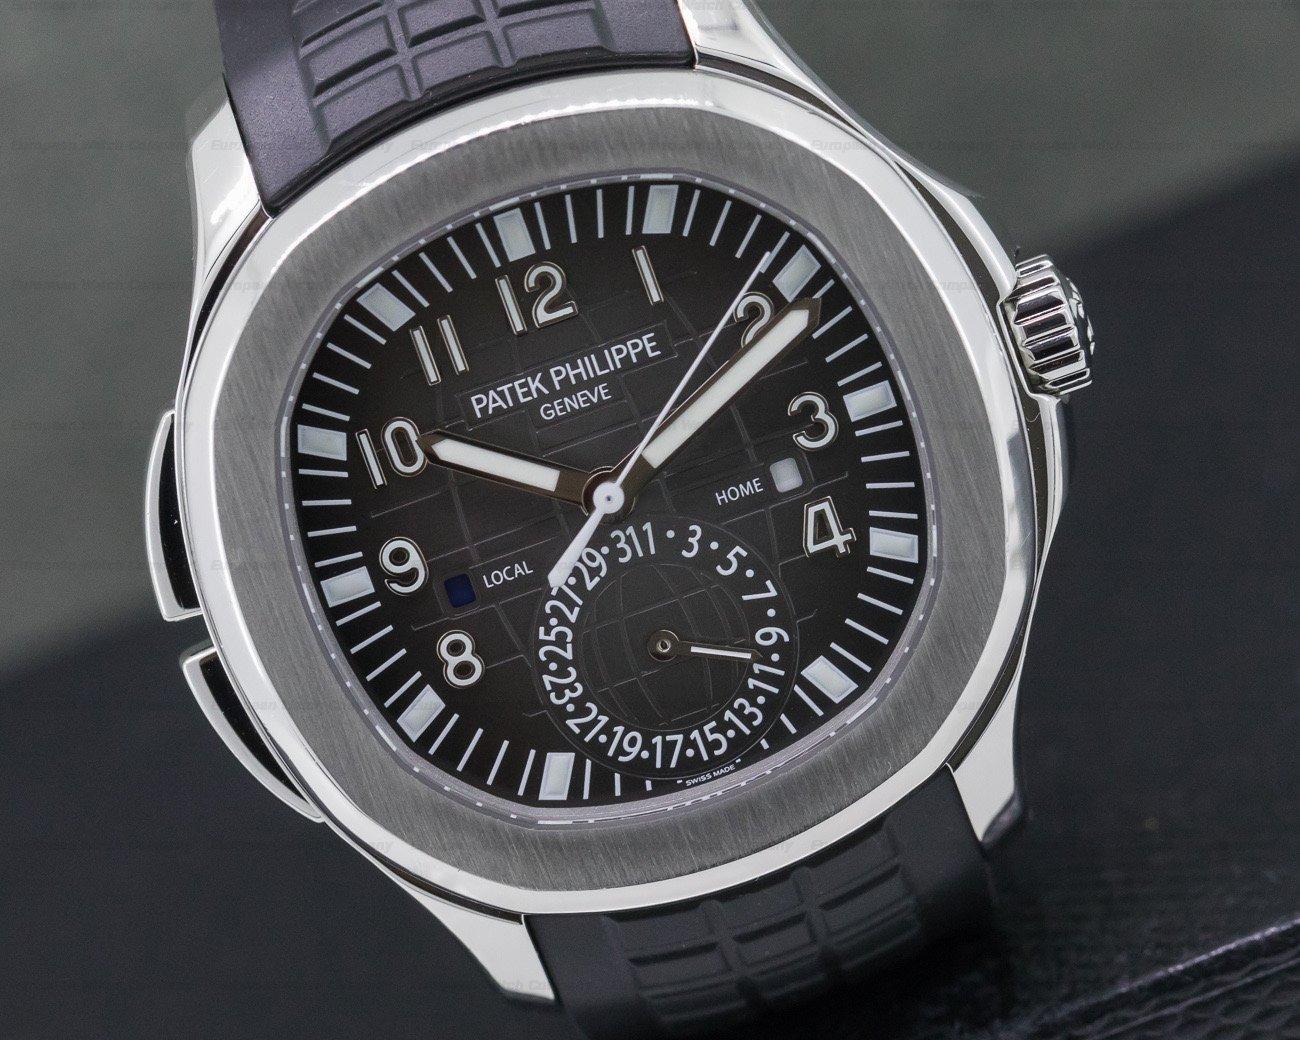 Patek Philippe 5164A-001 Aquanaut Travel Time SS / Rubber